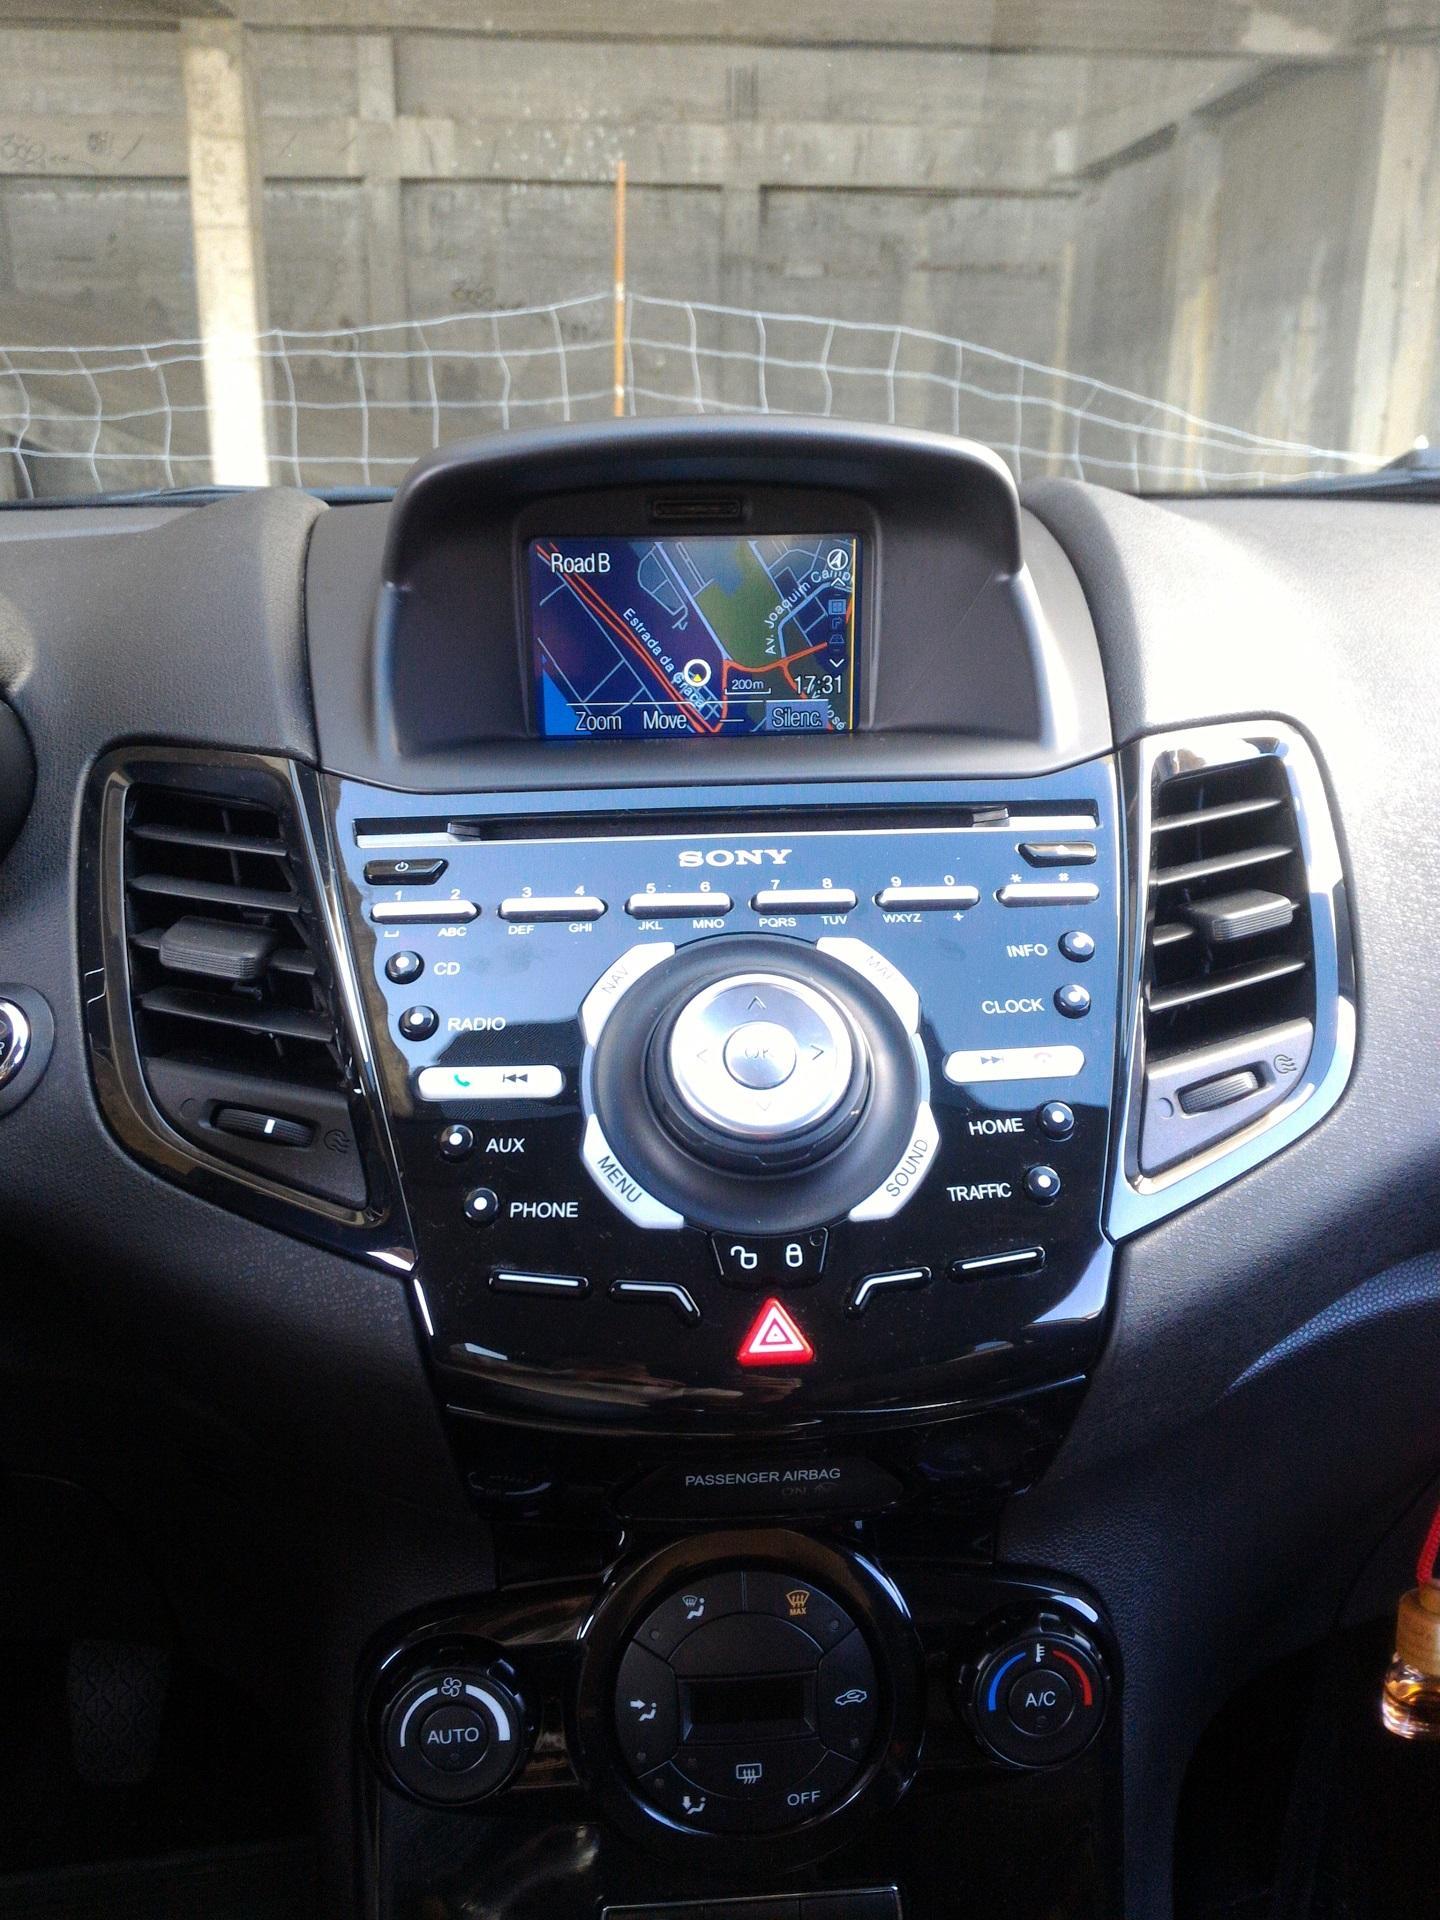 Img Jpg F E Fd F F D Ab Ddc E on Touch Screen Bluetooth Car Stereo